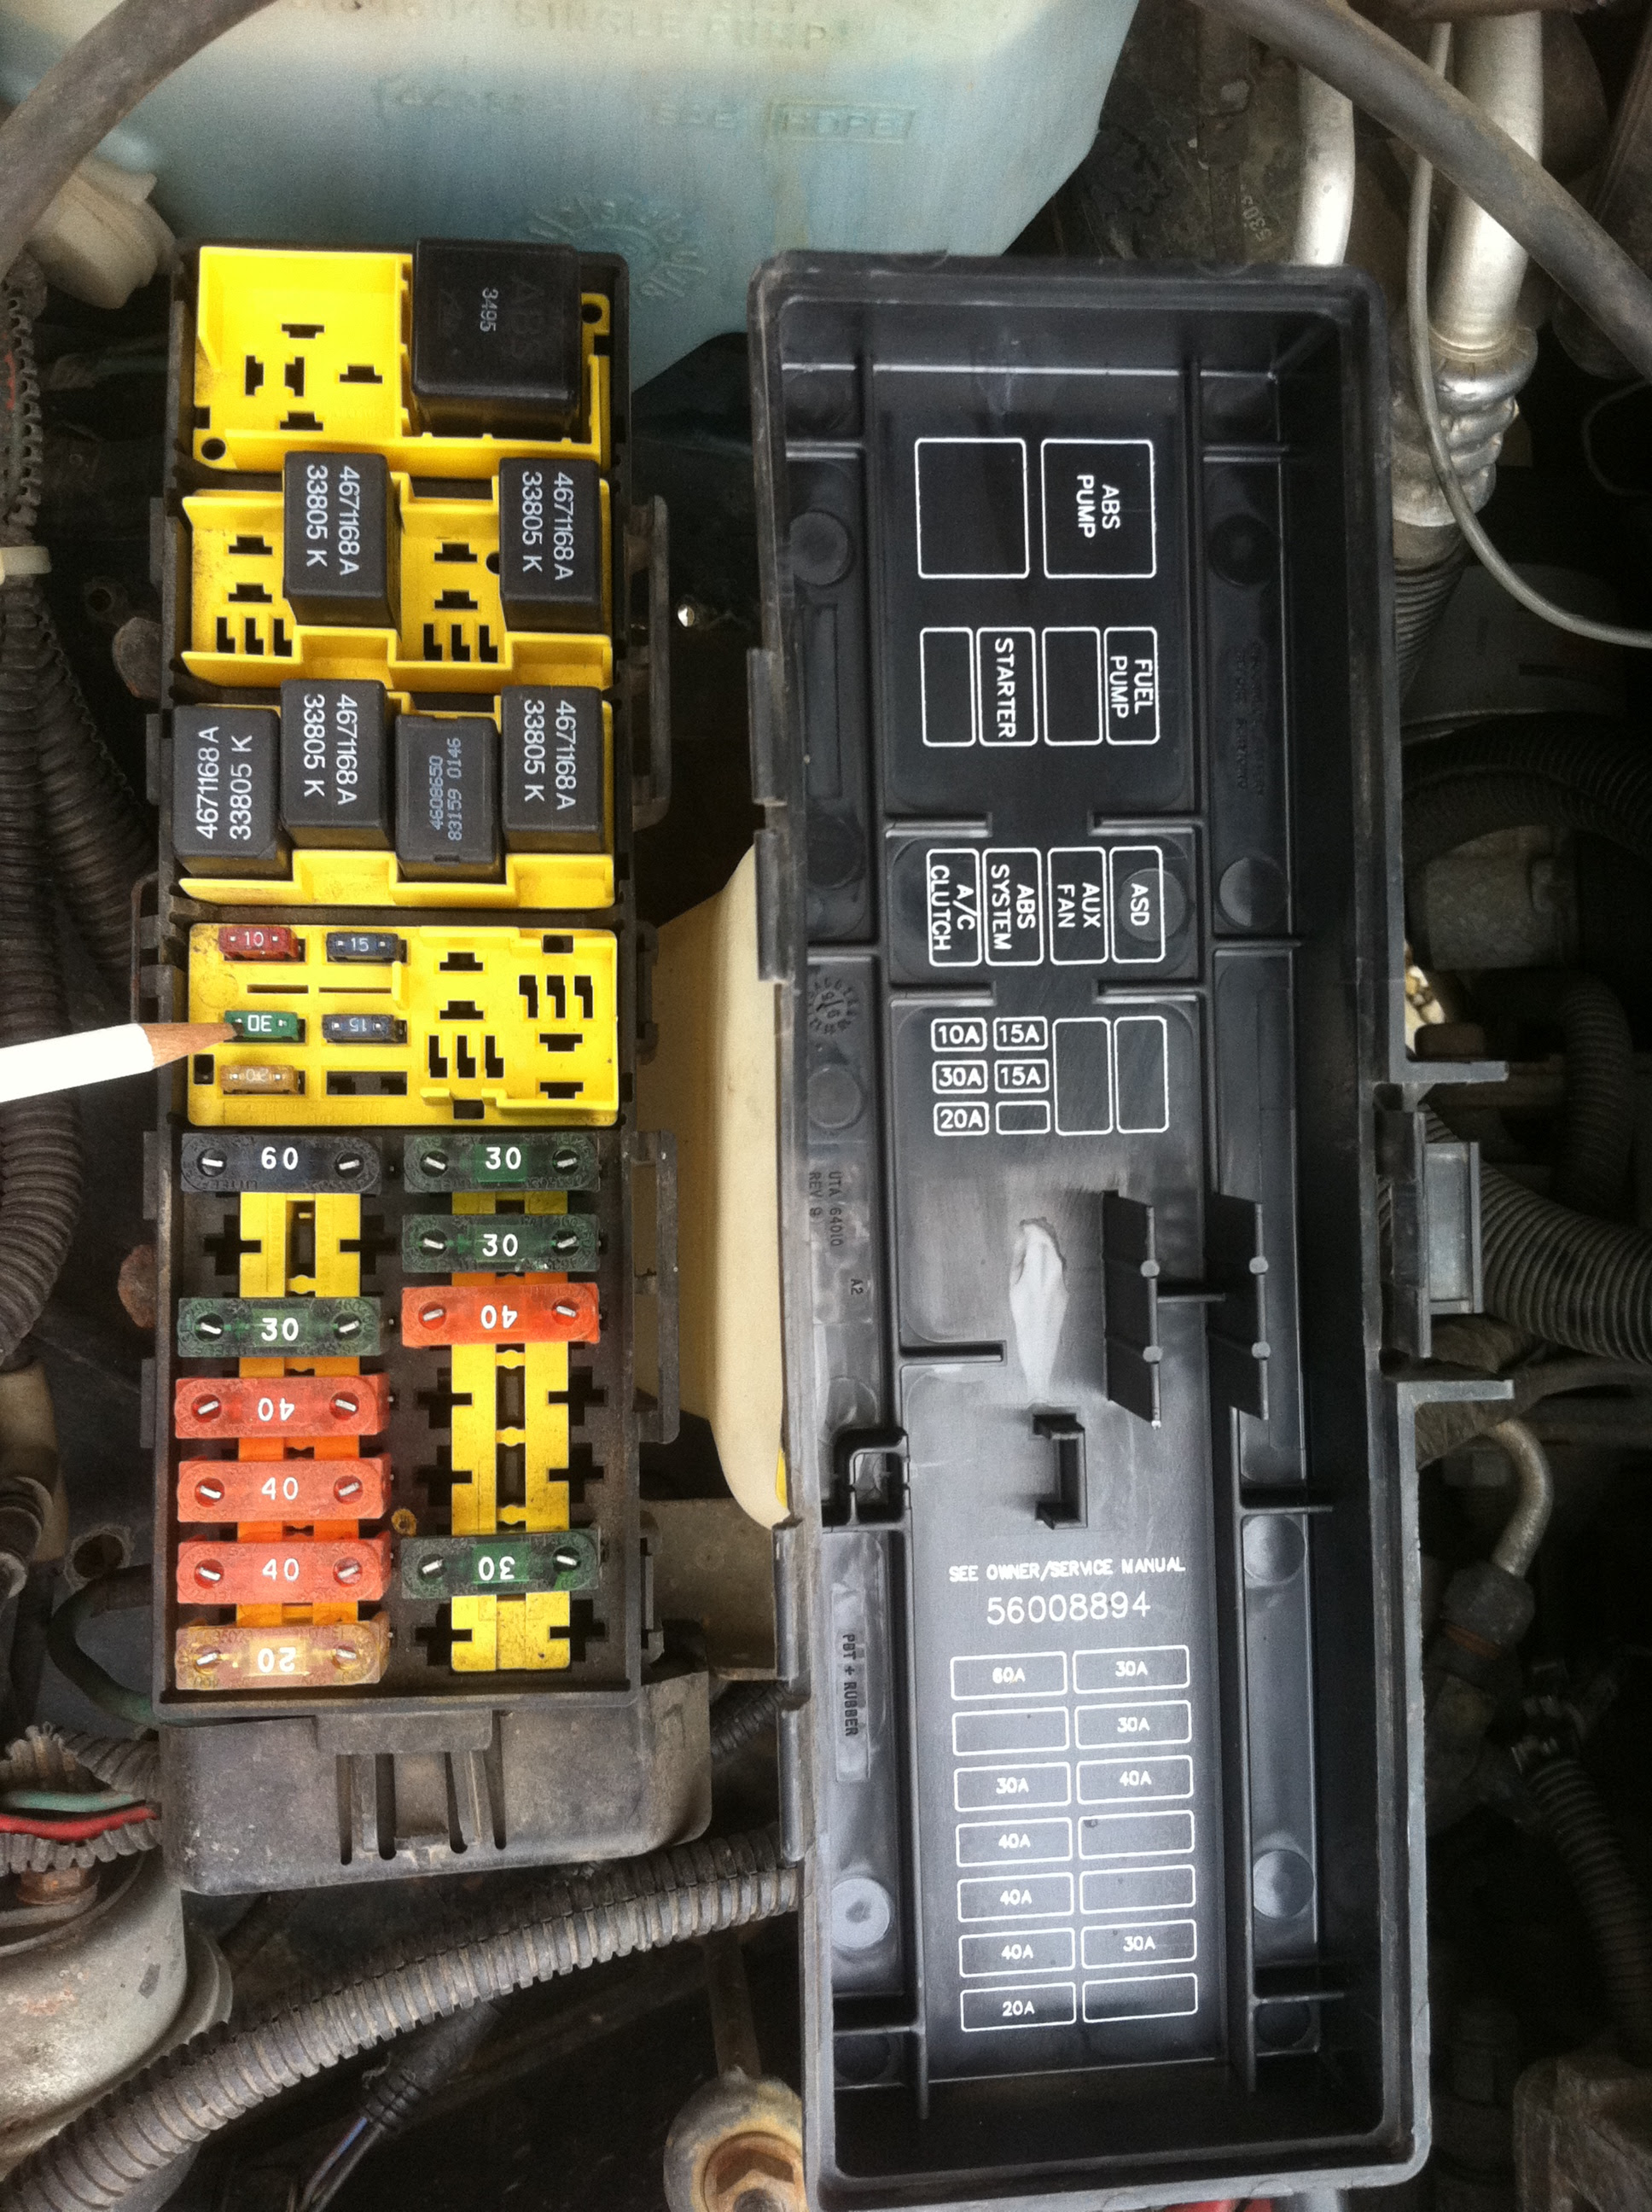 Jeep Cherokee Fuse Box 1996 Wiring Diagram Rub Warehouse Rub Warehouse Pmov2019 It